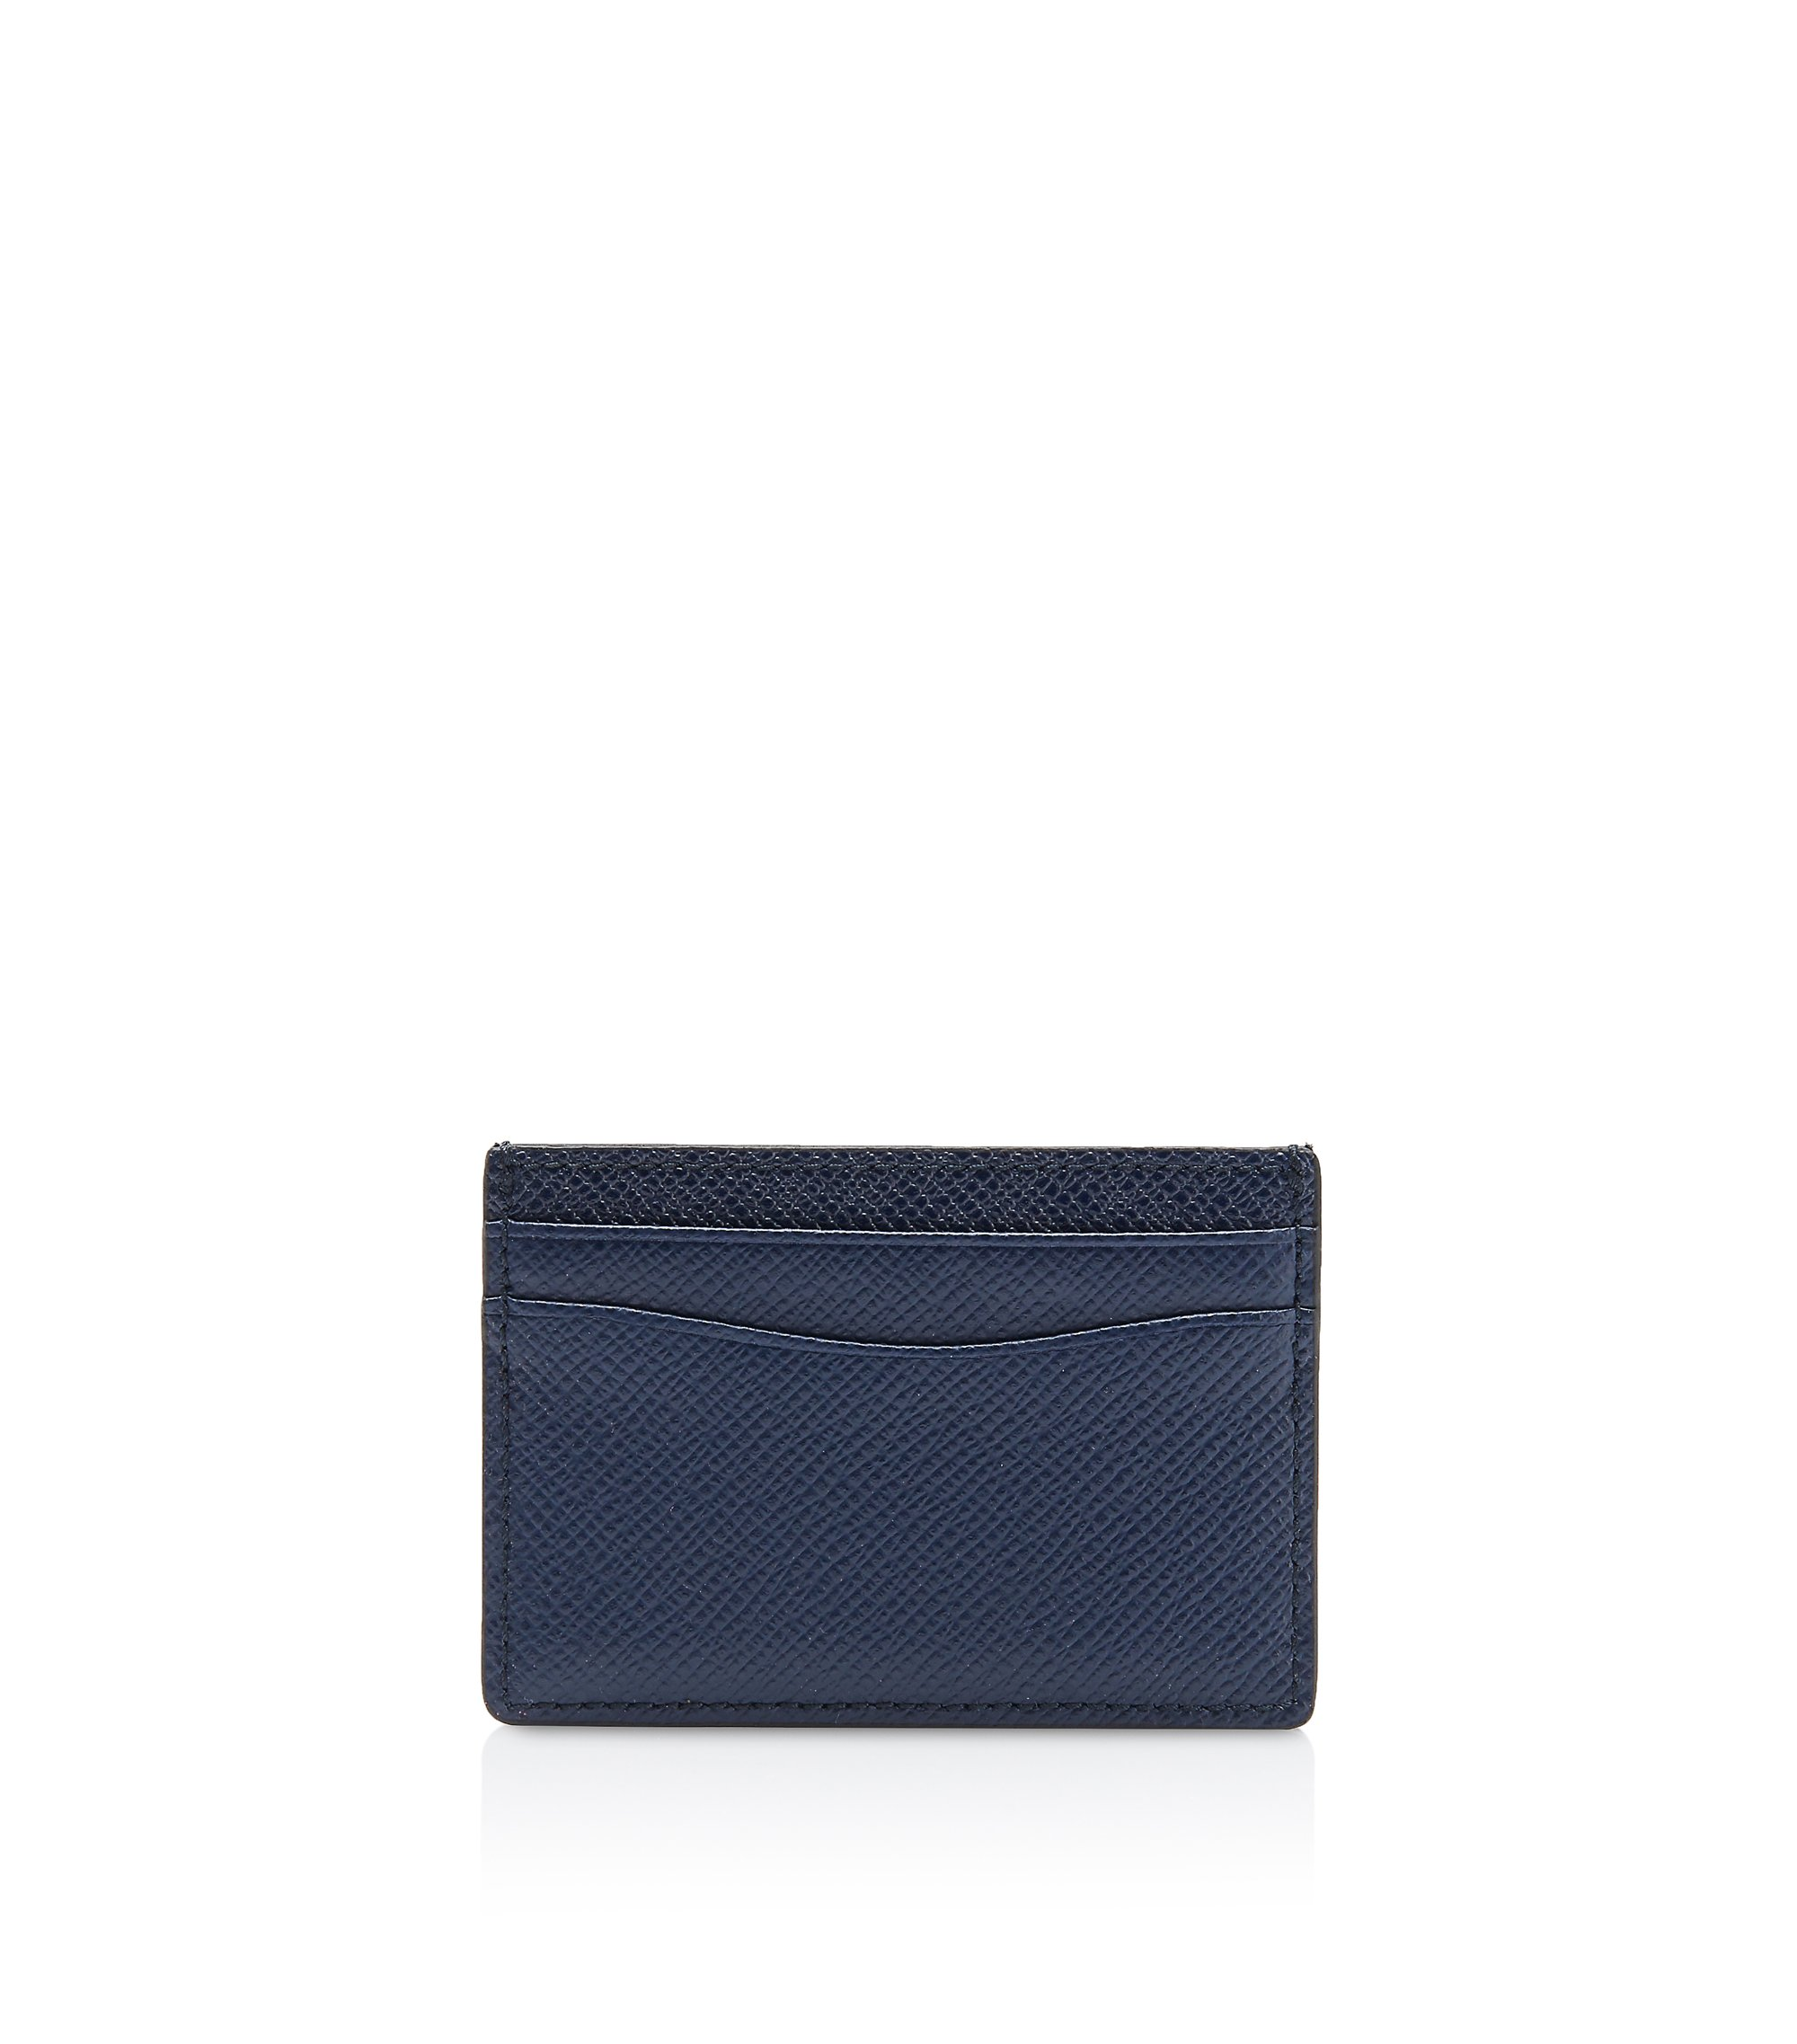 Signature Collection card holder in grained palmellato leather, Dark Blue